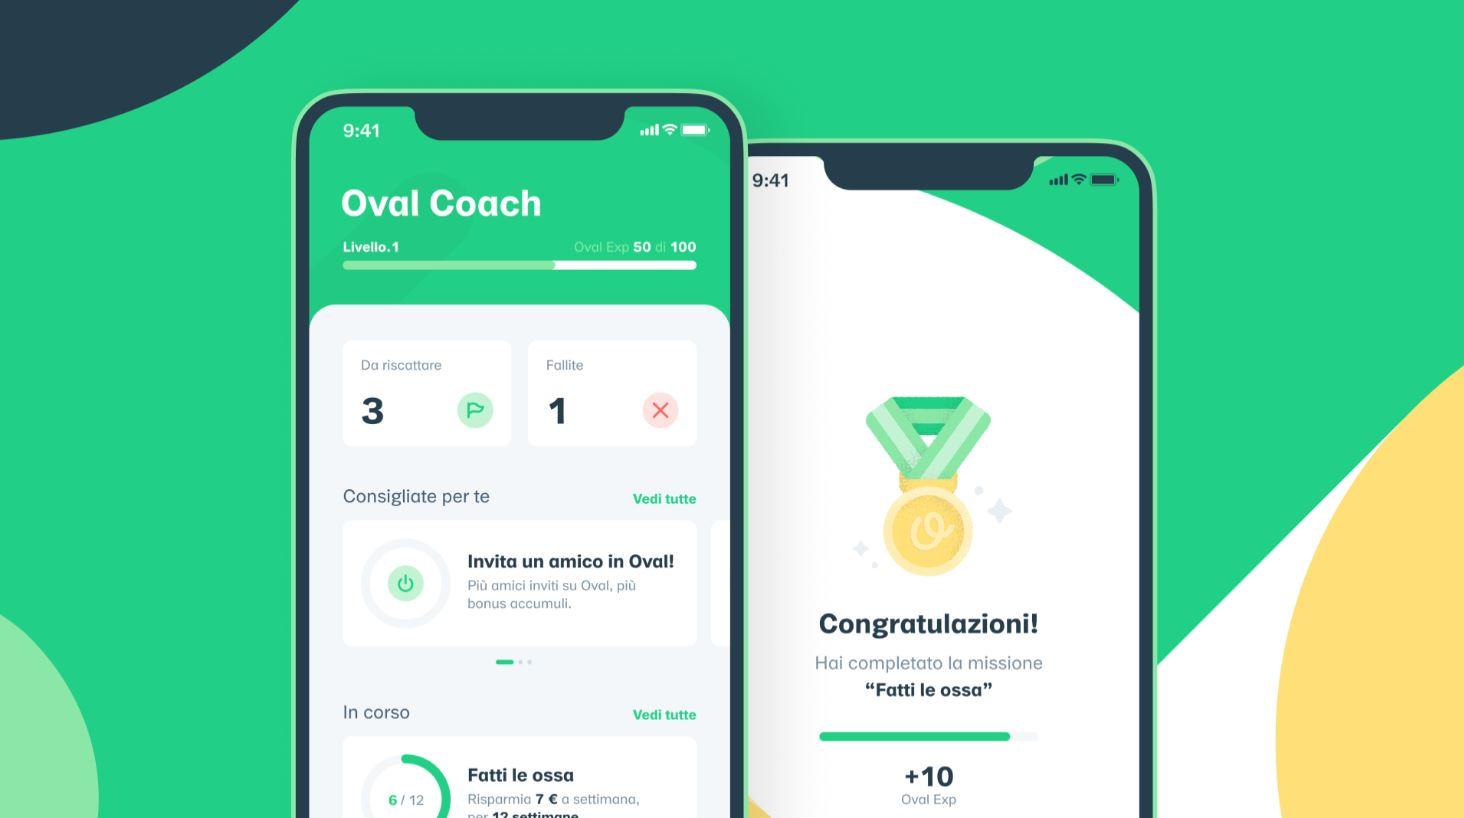 oval coach